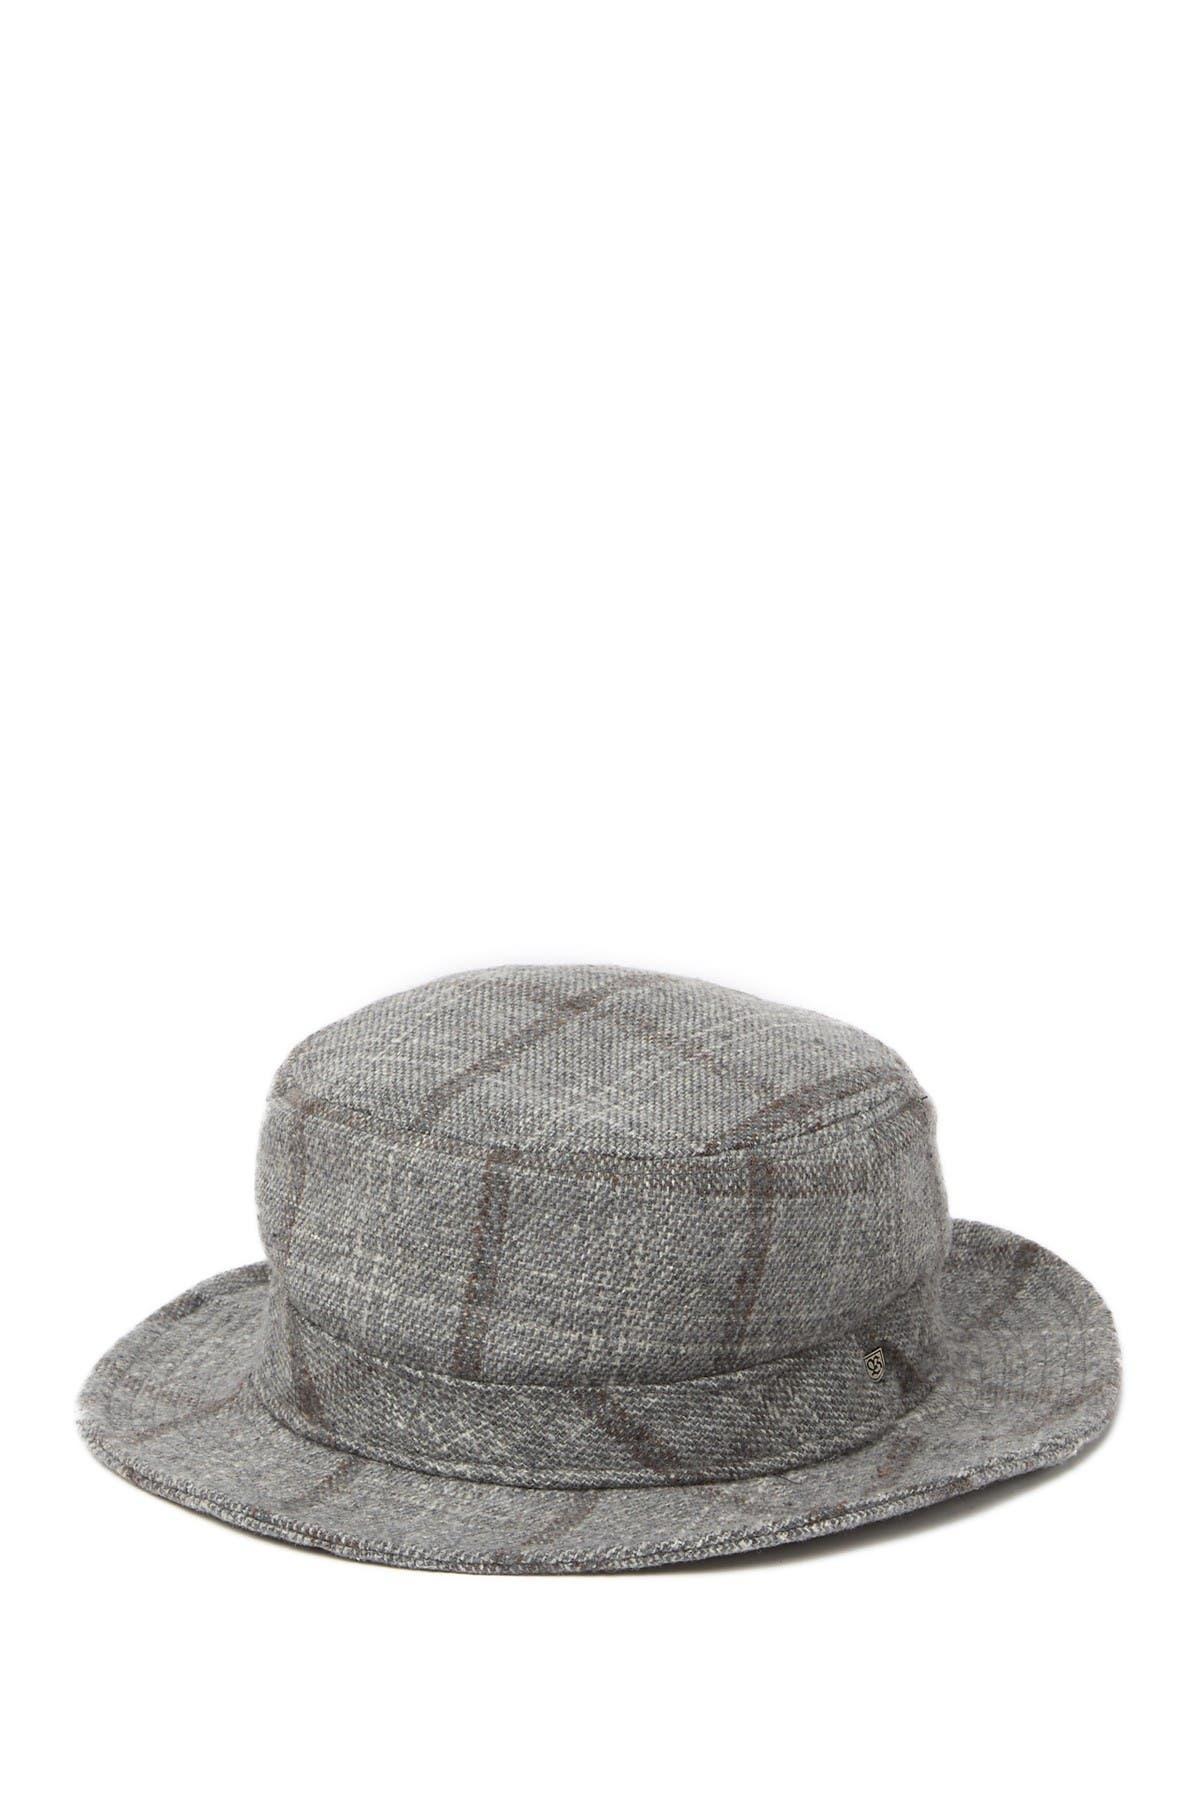 Image of Brixton Hardy Bucket Hat